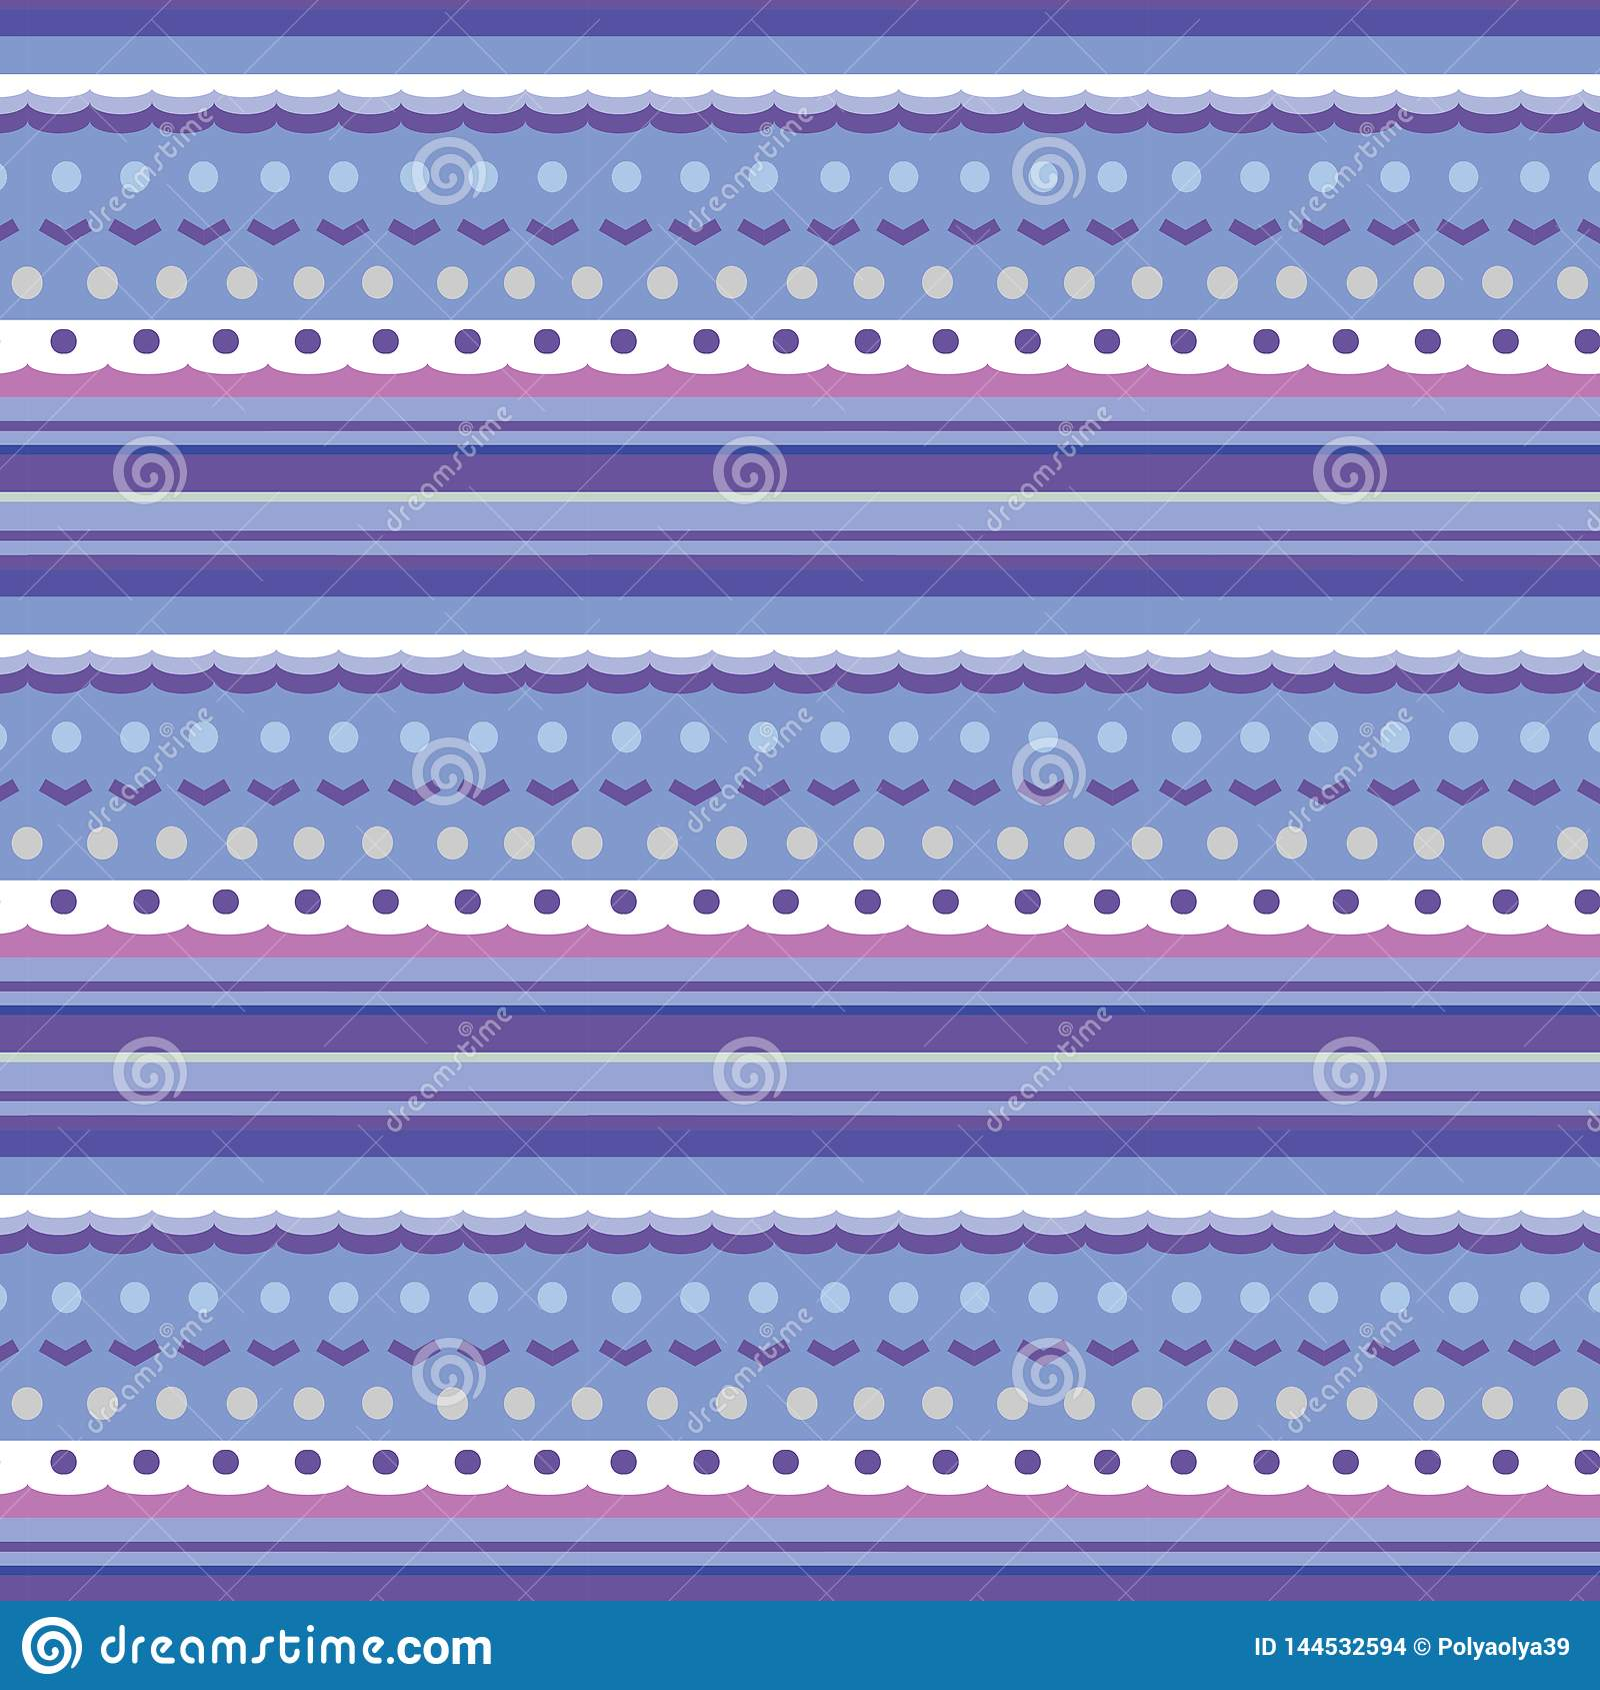 Textura inconsútil como modelo que hace punto con las diversos rayas, puntos y ondas